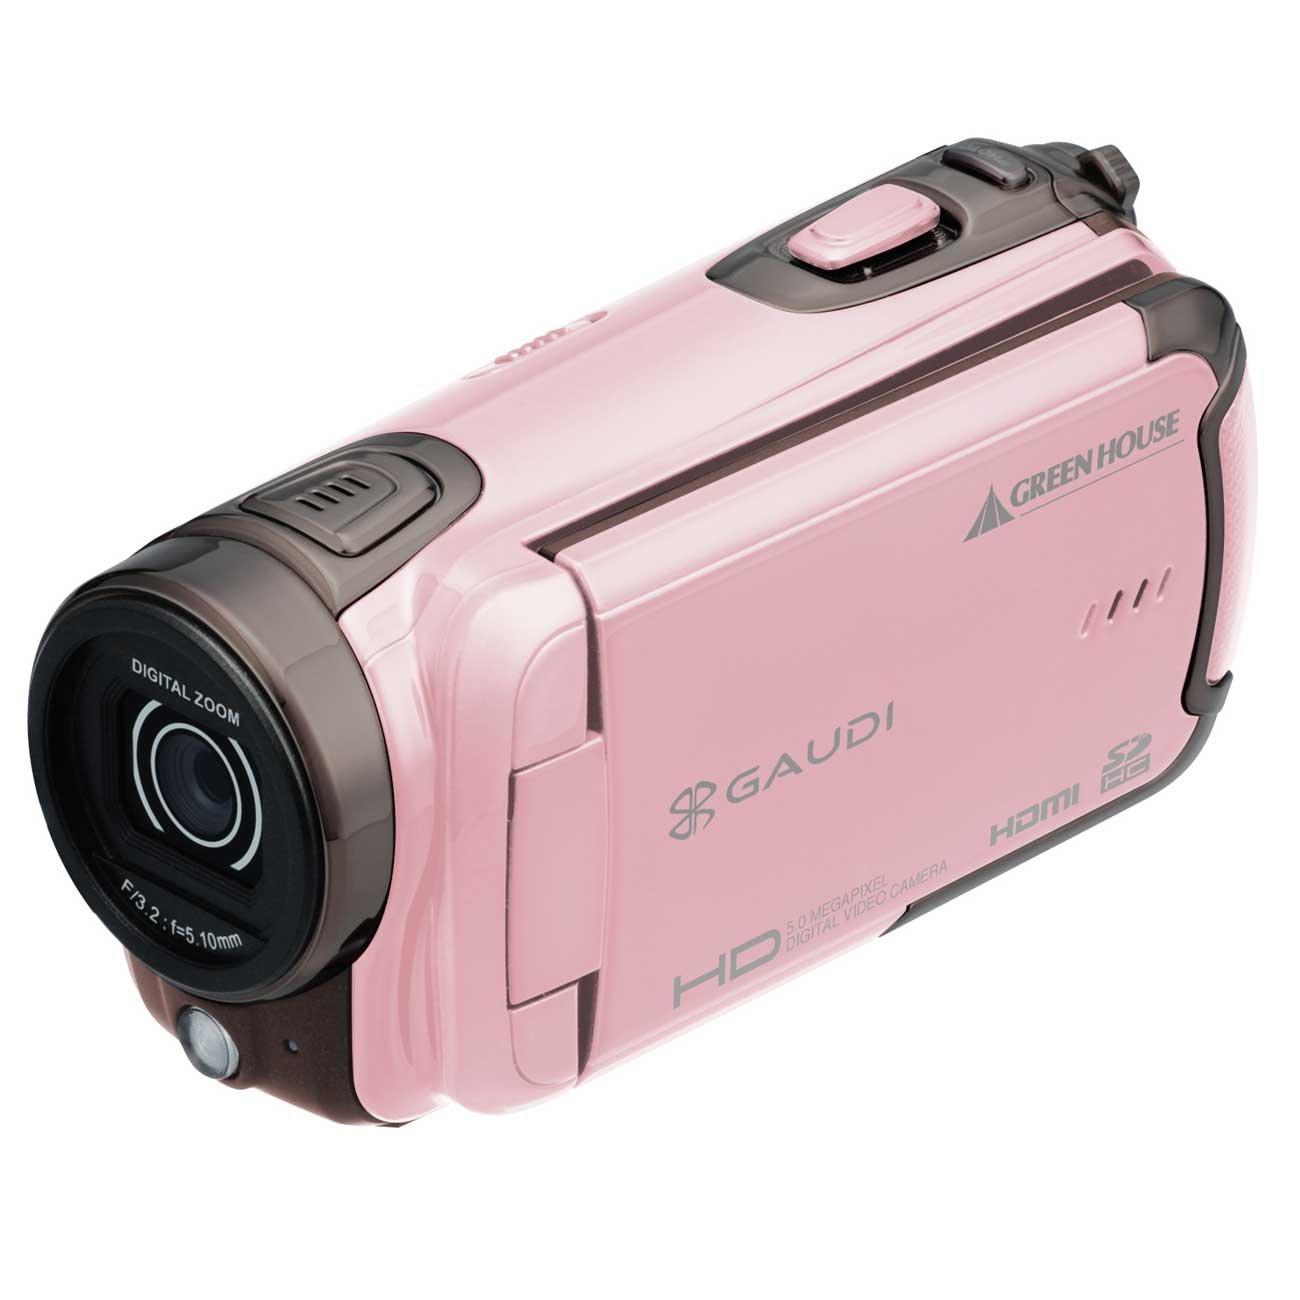 GREEN HOUSE 乾電池駆動HDデジタルビデオカメラ ピンク   B005DU4XMI